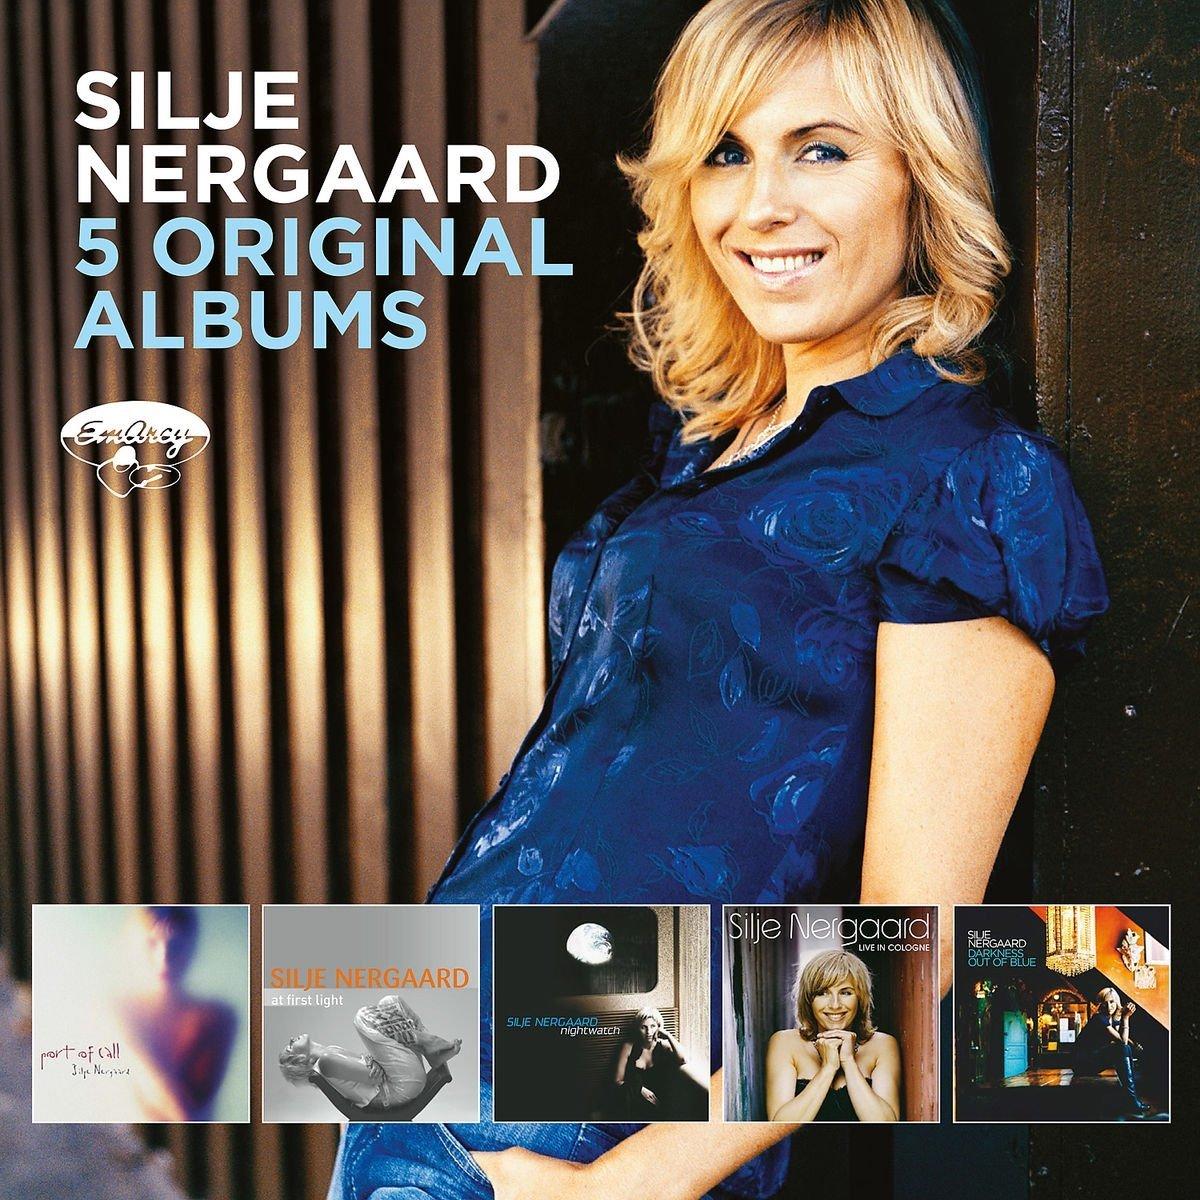 SILJE NERGAARD 5 Original Albums reviews  SILJE NERGAARD ...